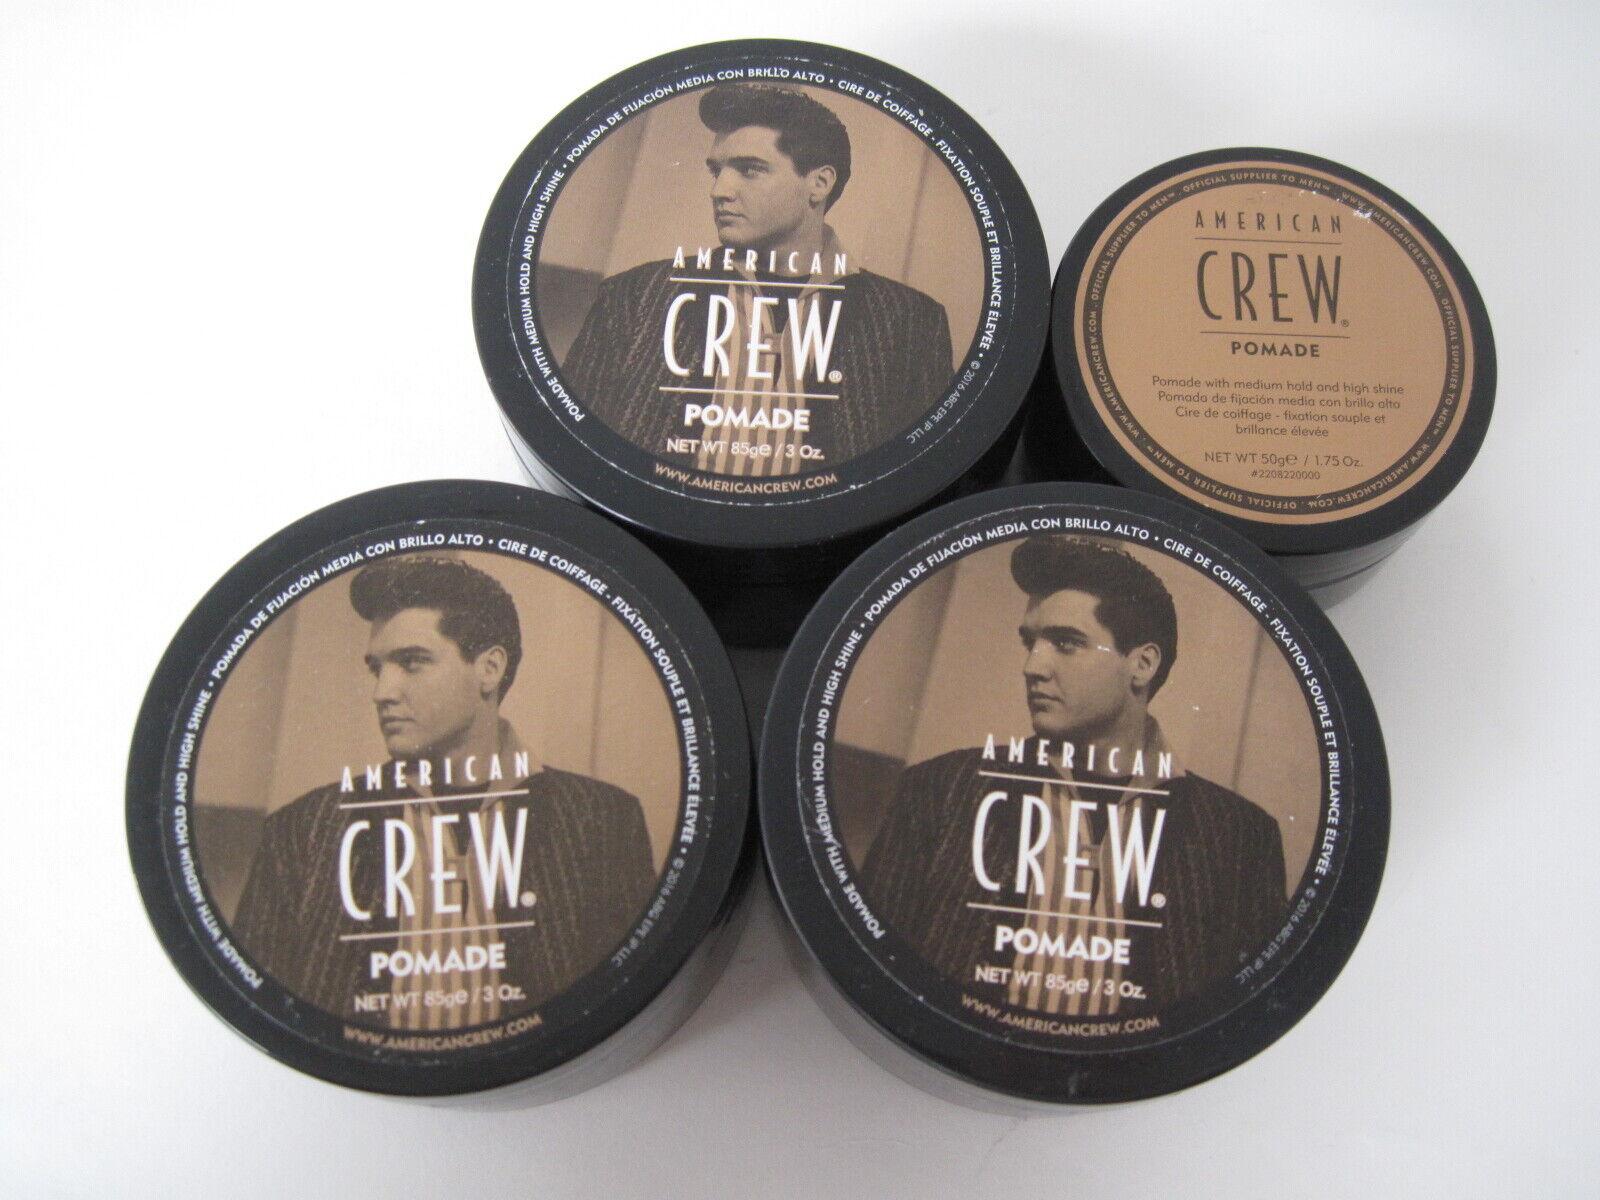 American Crew Pomade 3 oz + 1.75 oz **4 jars**